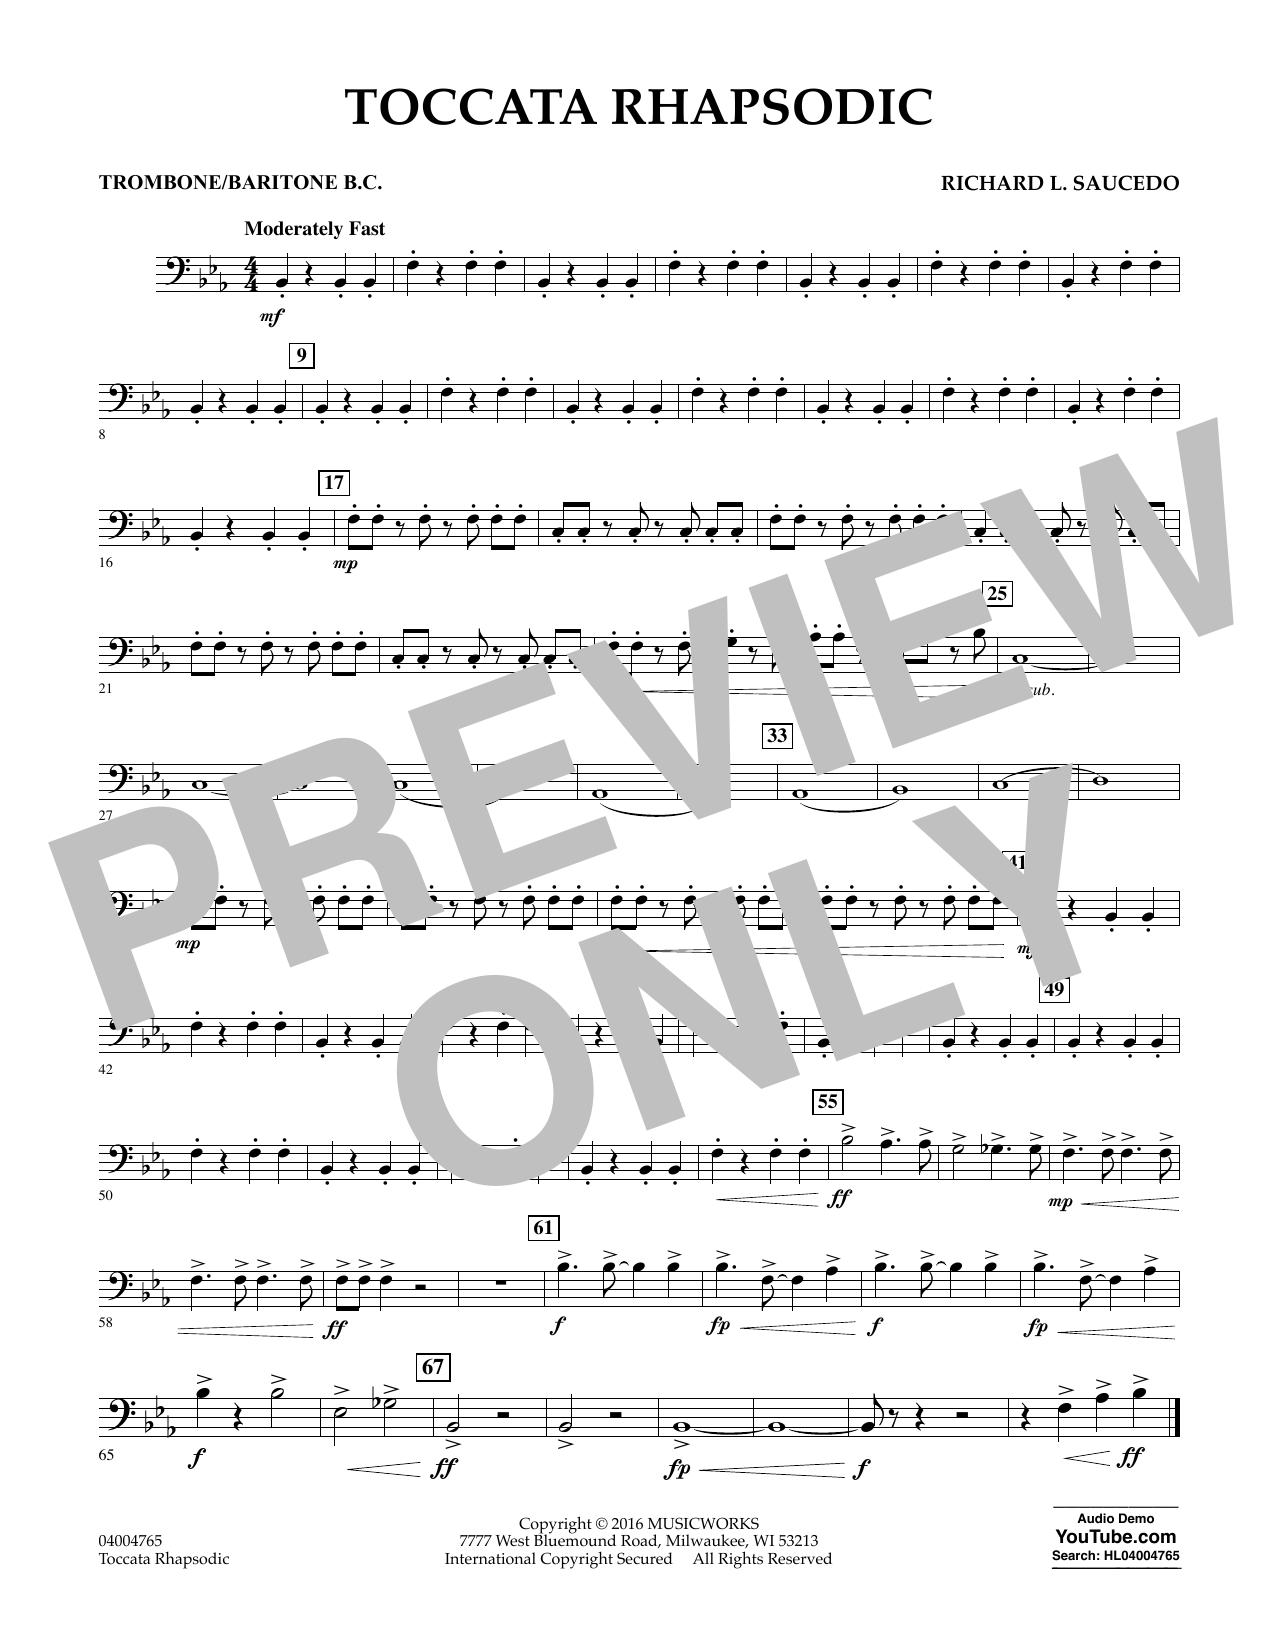 Toccata Rhapsodic - Trombone/Baritone B.C.